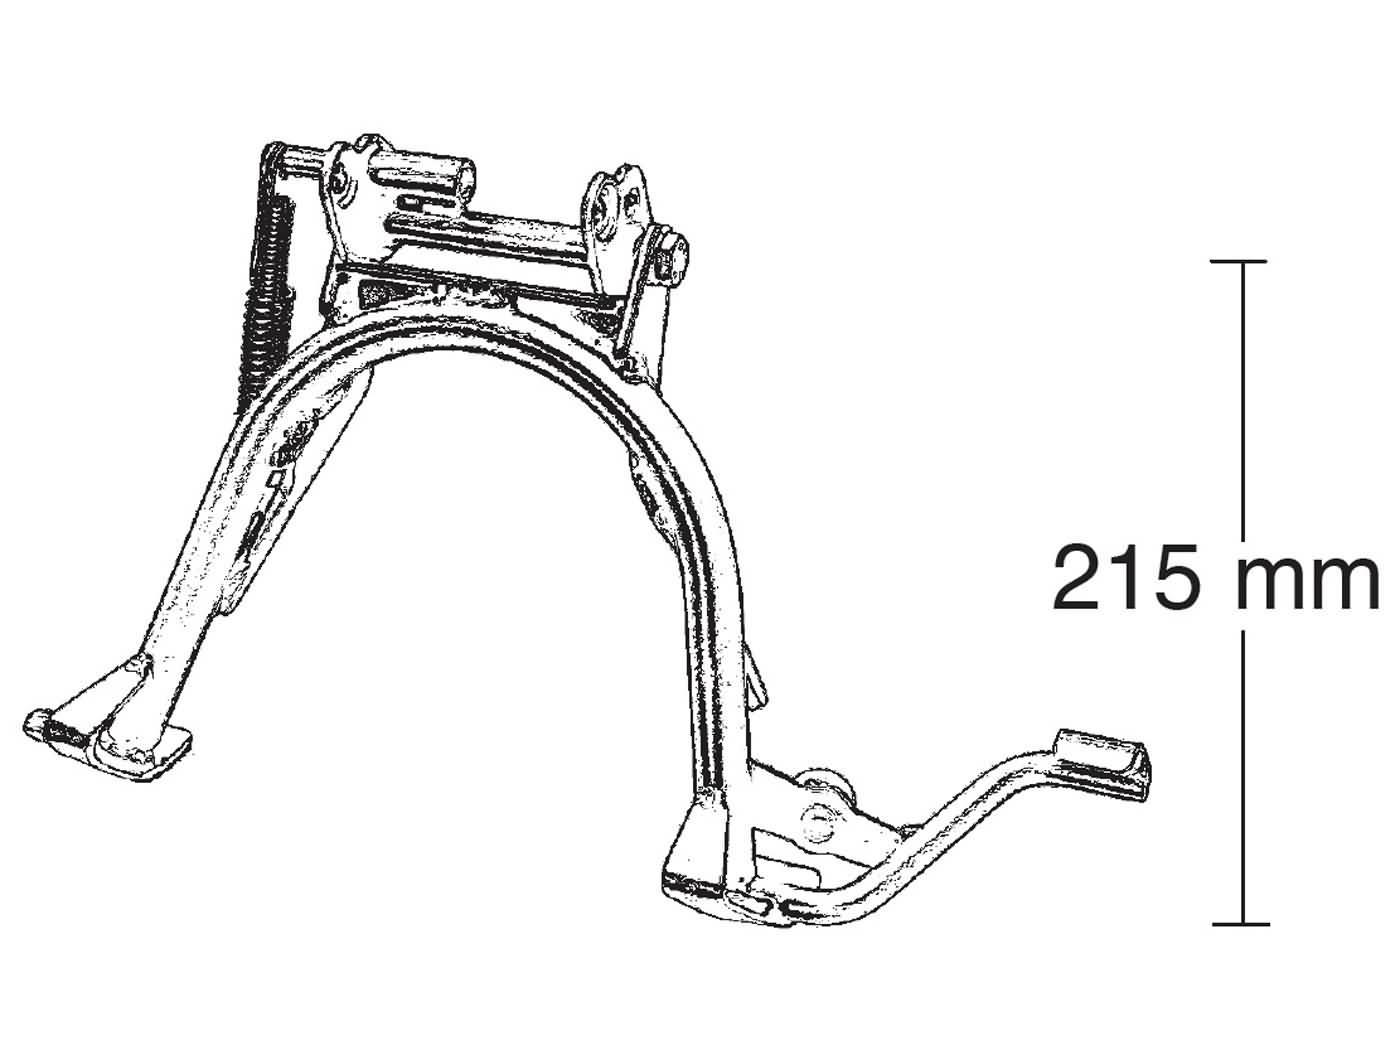 main stand repair kit Buzzetti for Aprilia SR50, MBK Nitro